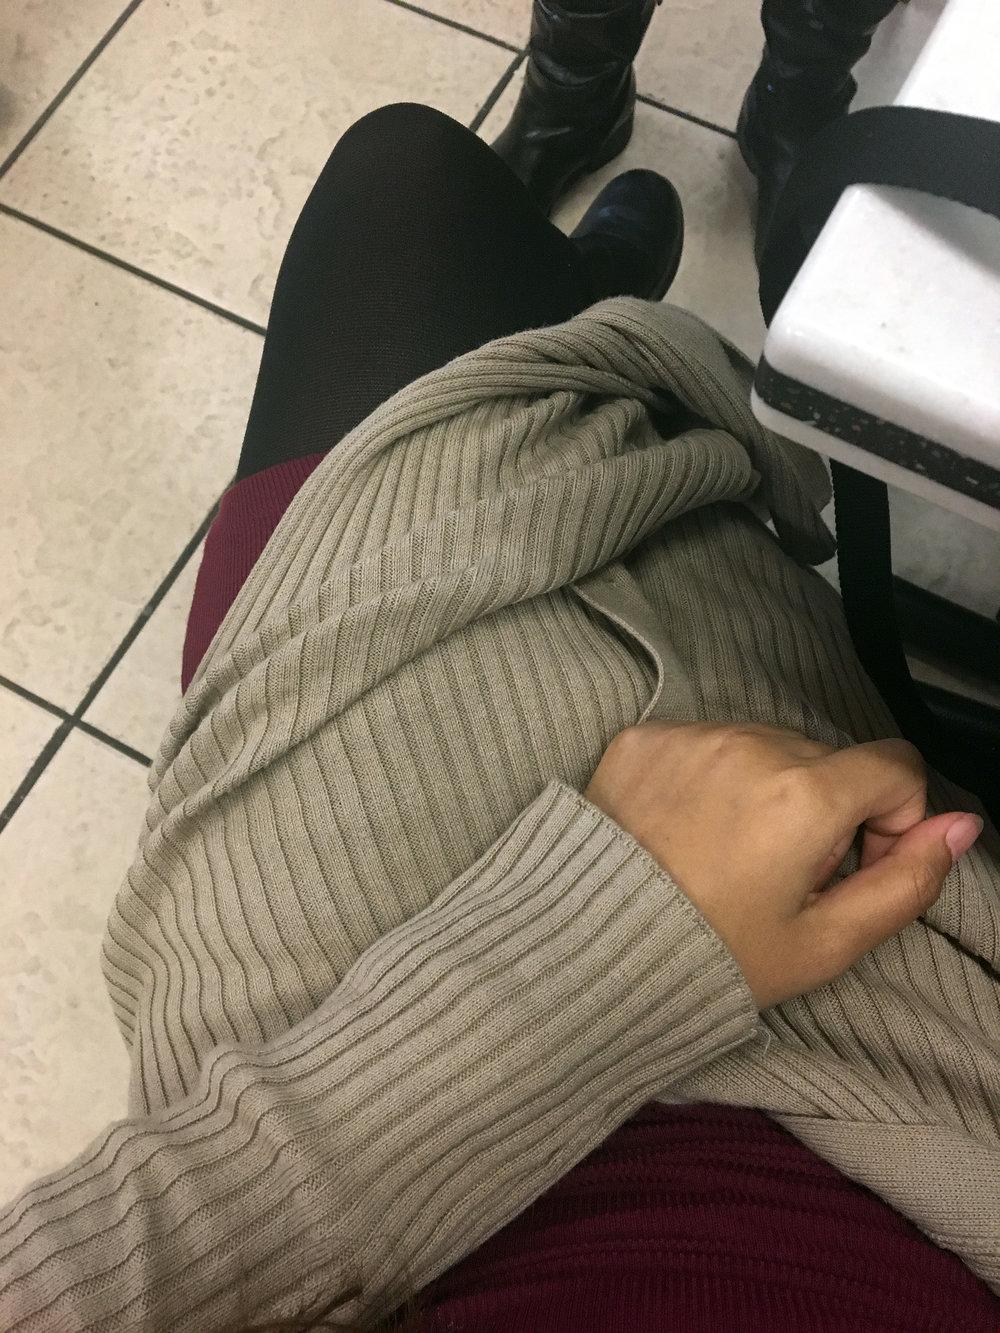 Sweater-Dresses-Long-Slit-Cardigans-Blogger-Style-LINDATENCHITRAN-6-1616X1080.jpg